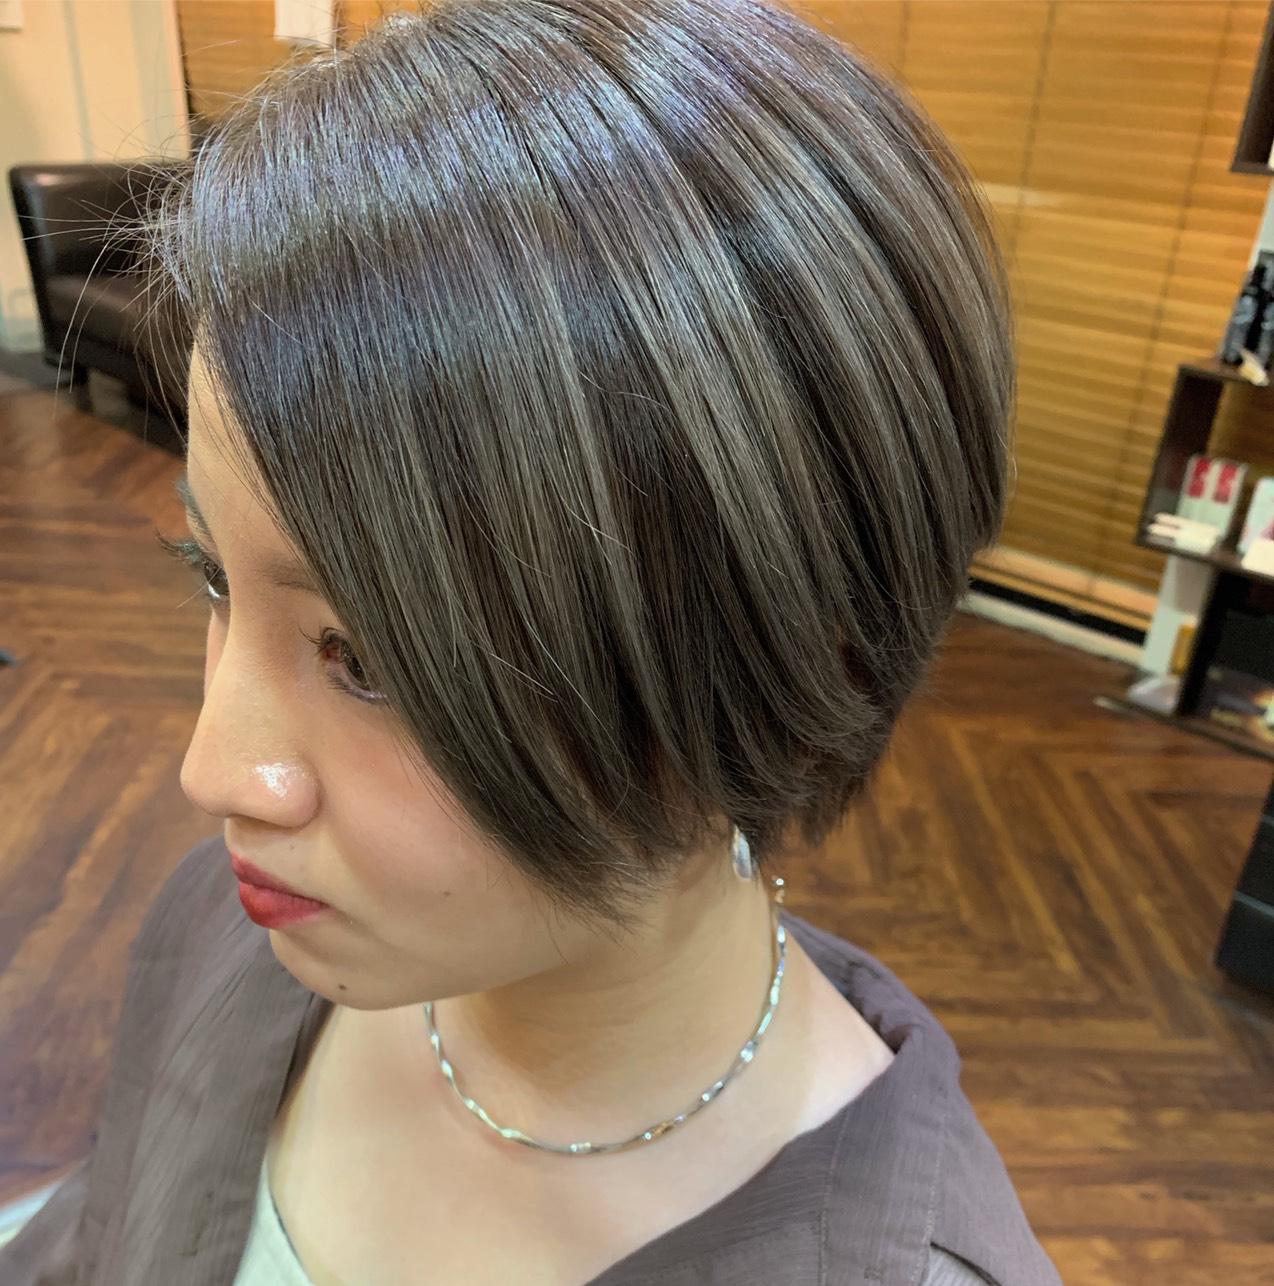 http://ad1030pcqc.smartrelease.jp/news/S__9257008.jpg